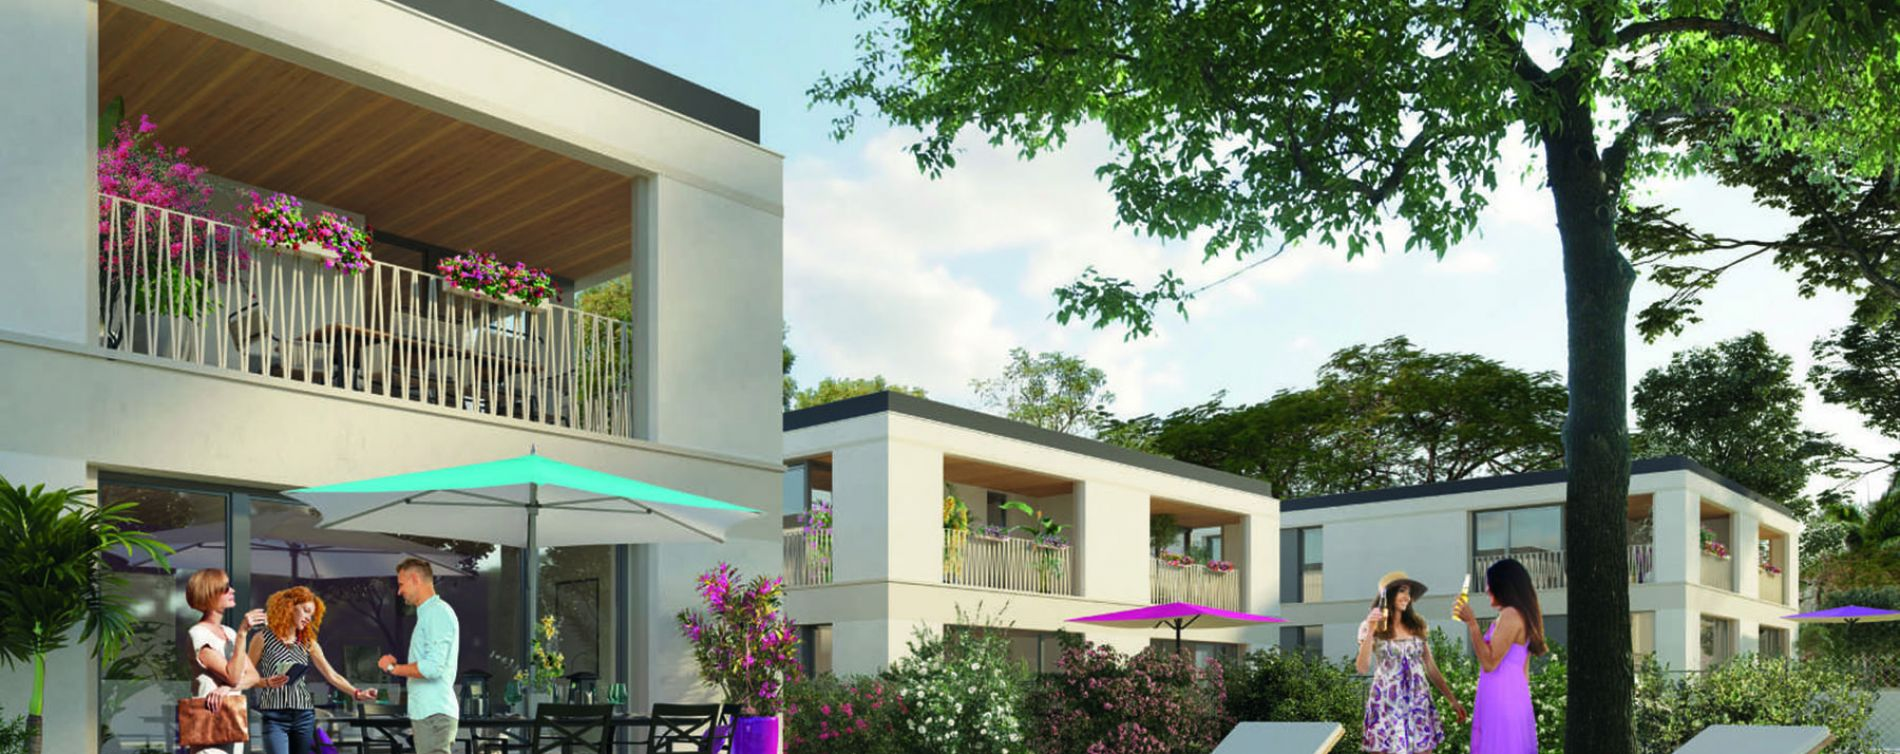 Feyzin : programme immobilier neuve « Be Twin »